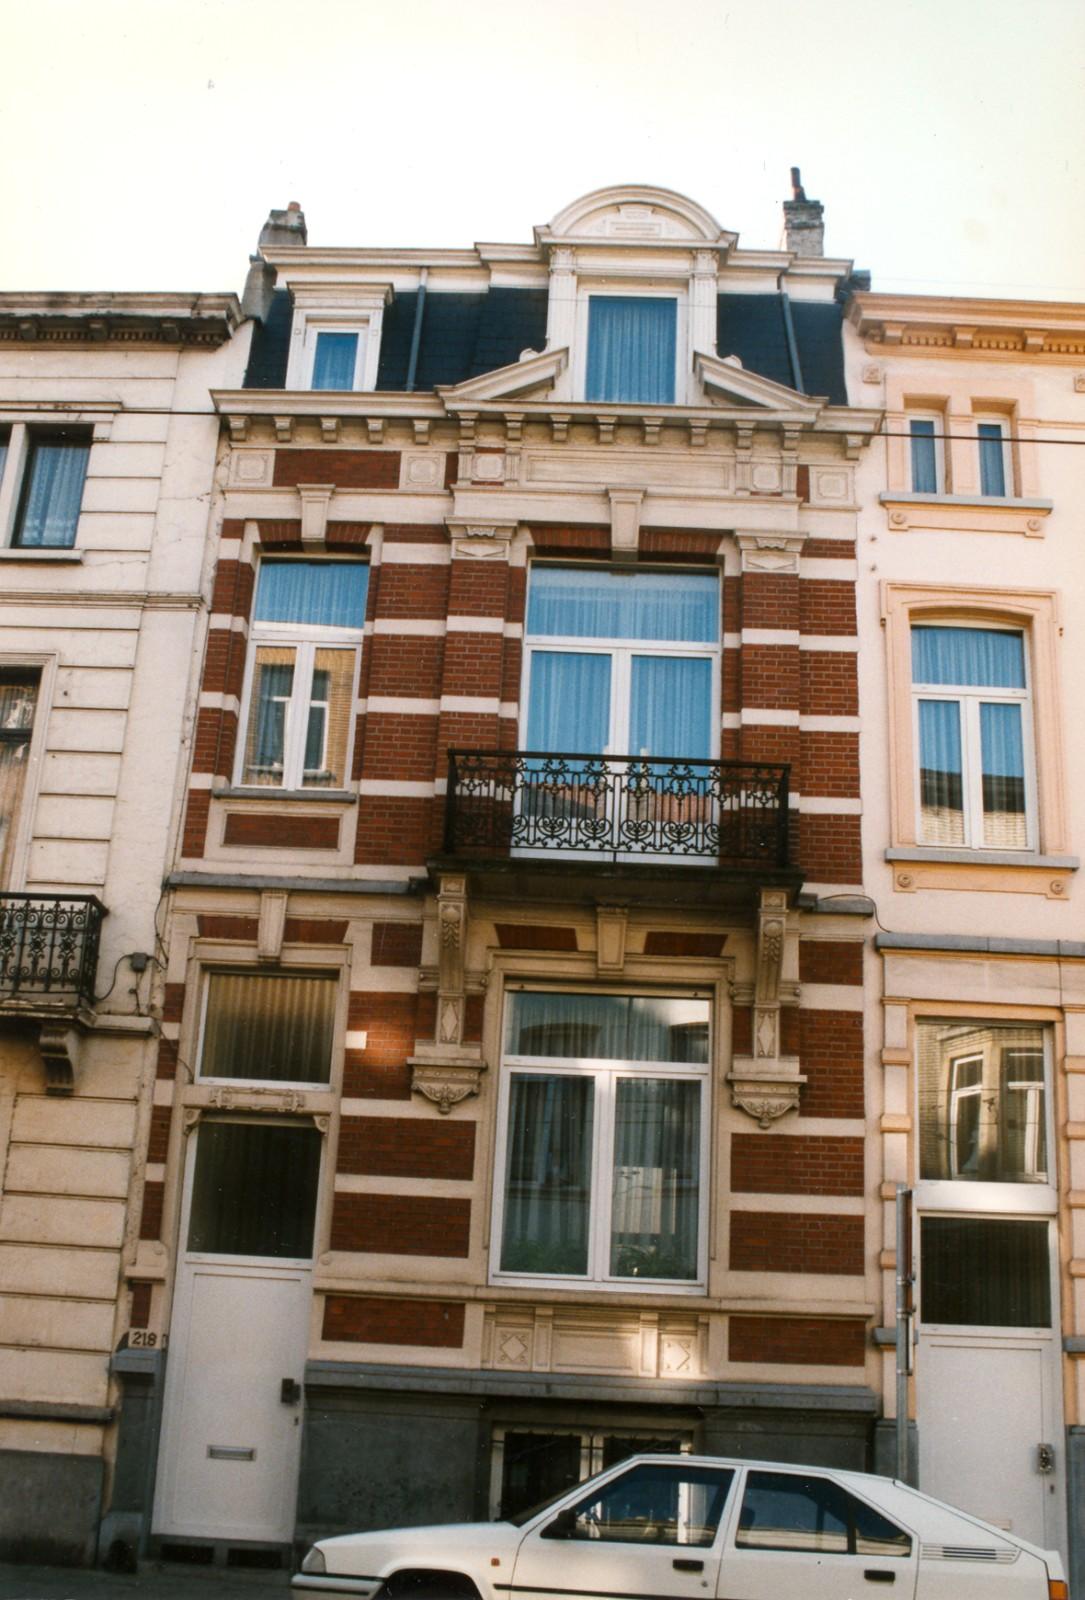 Rue Théodore Verhaegen 218., 1998